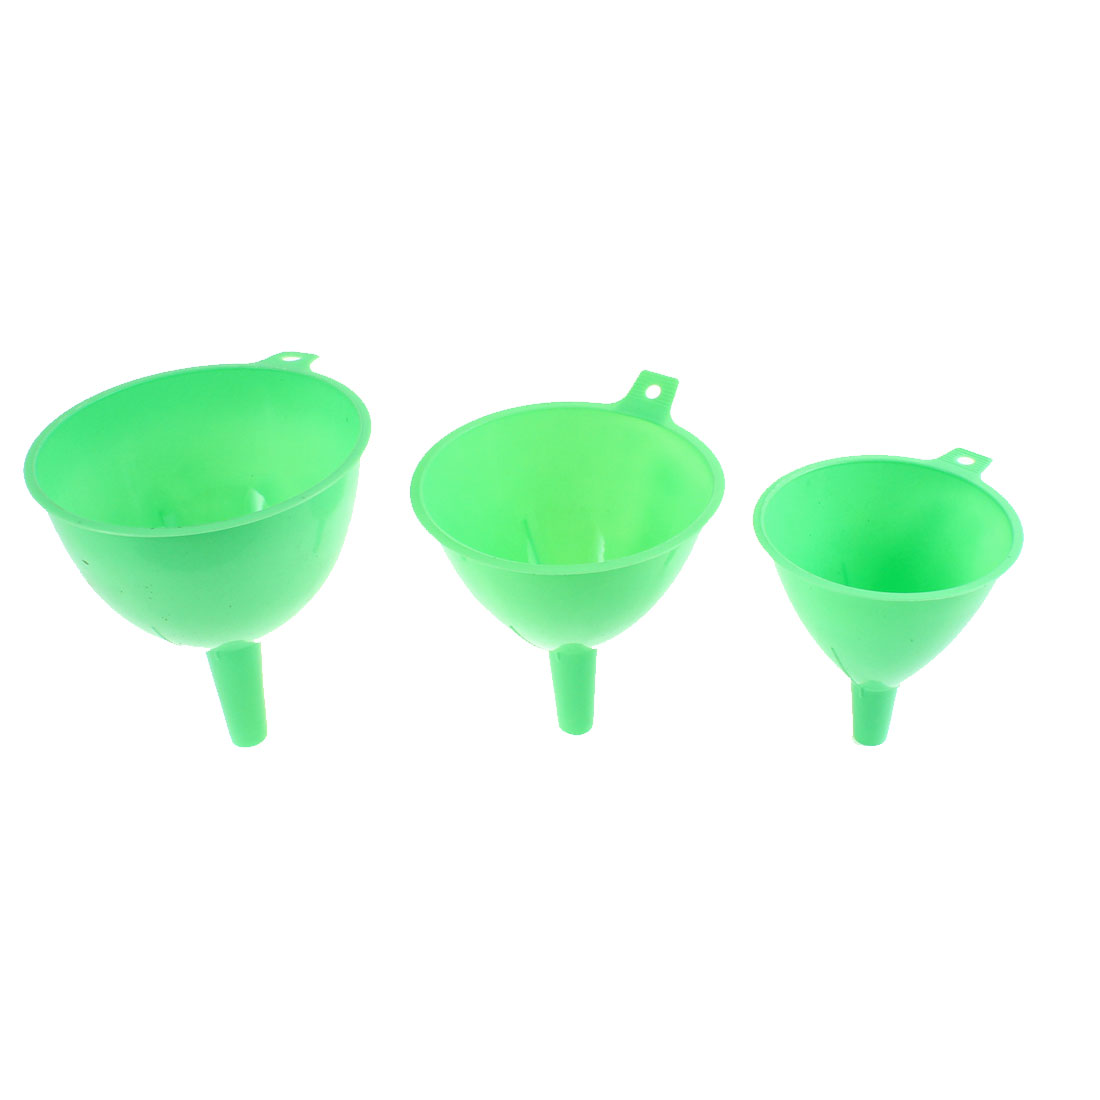 Kitchen Plastic Wine Liquor Water Filter Funnels Set Green 3 in 1